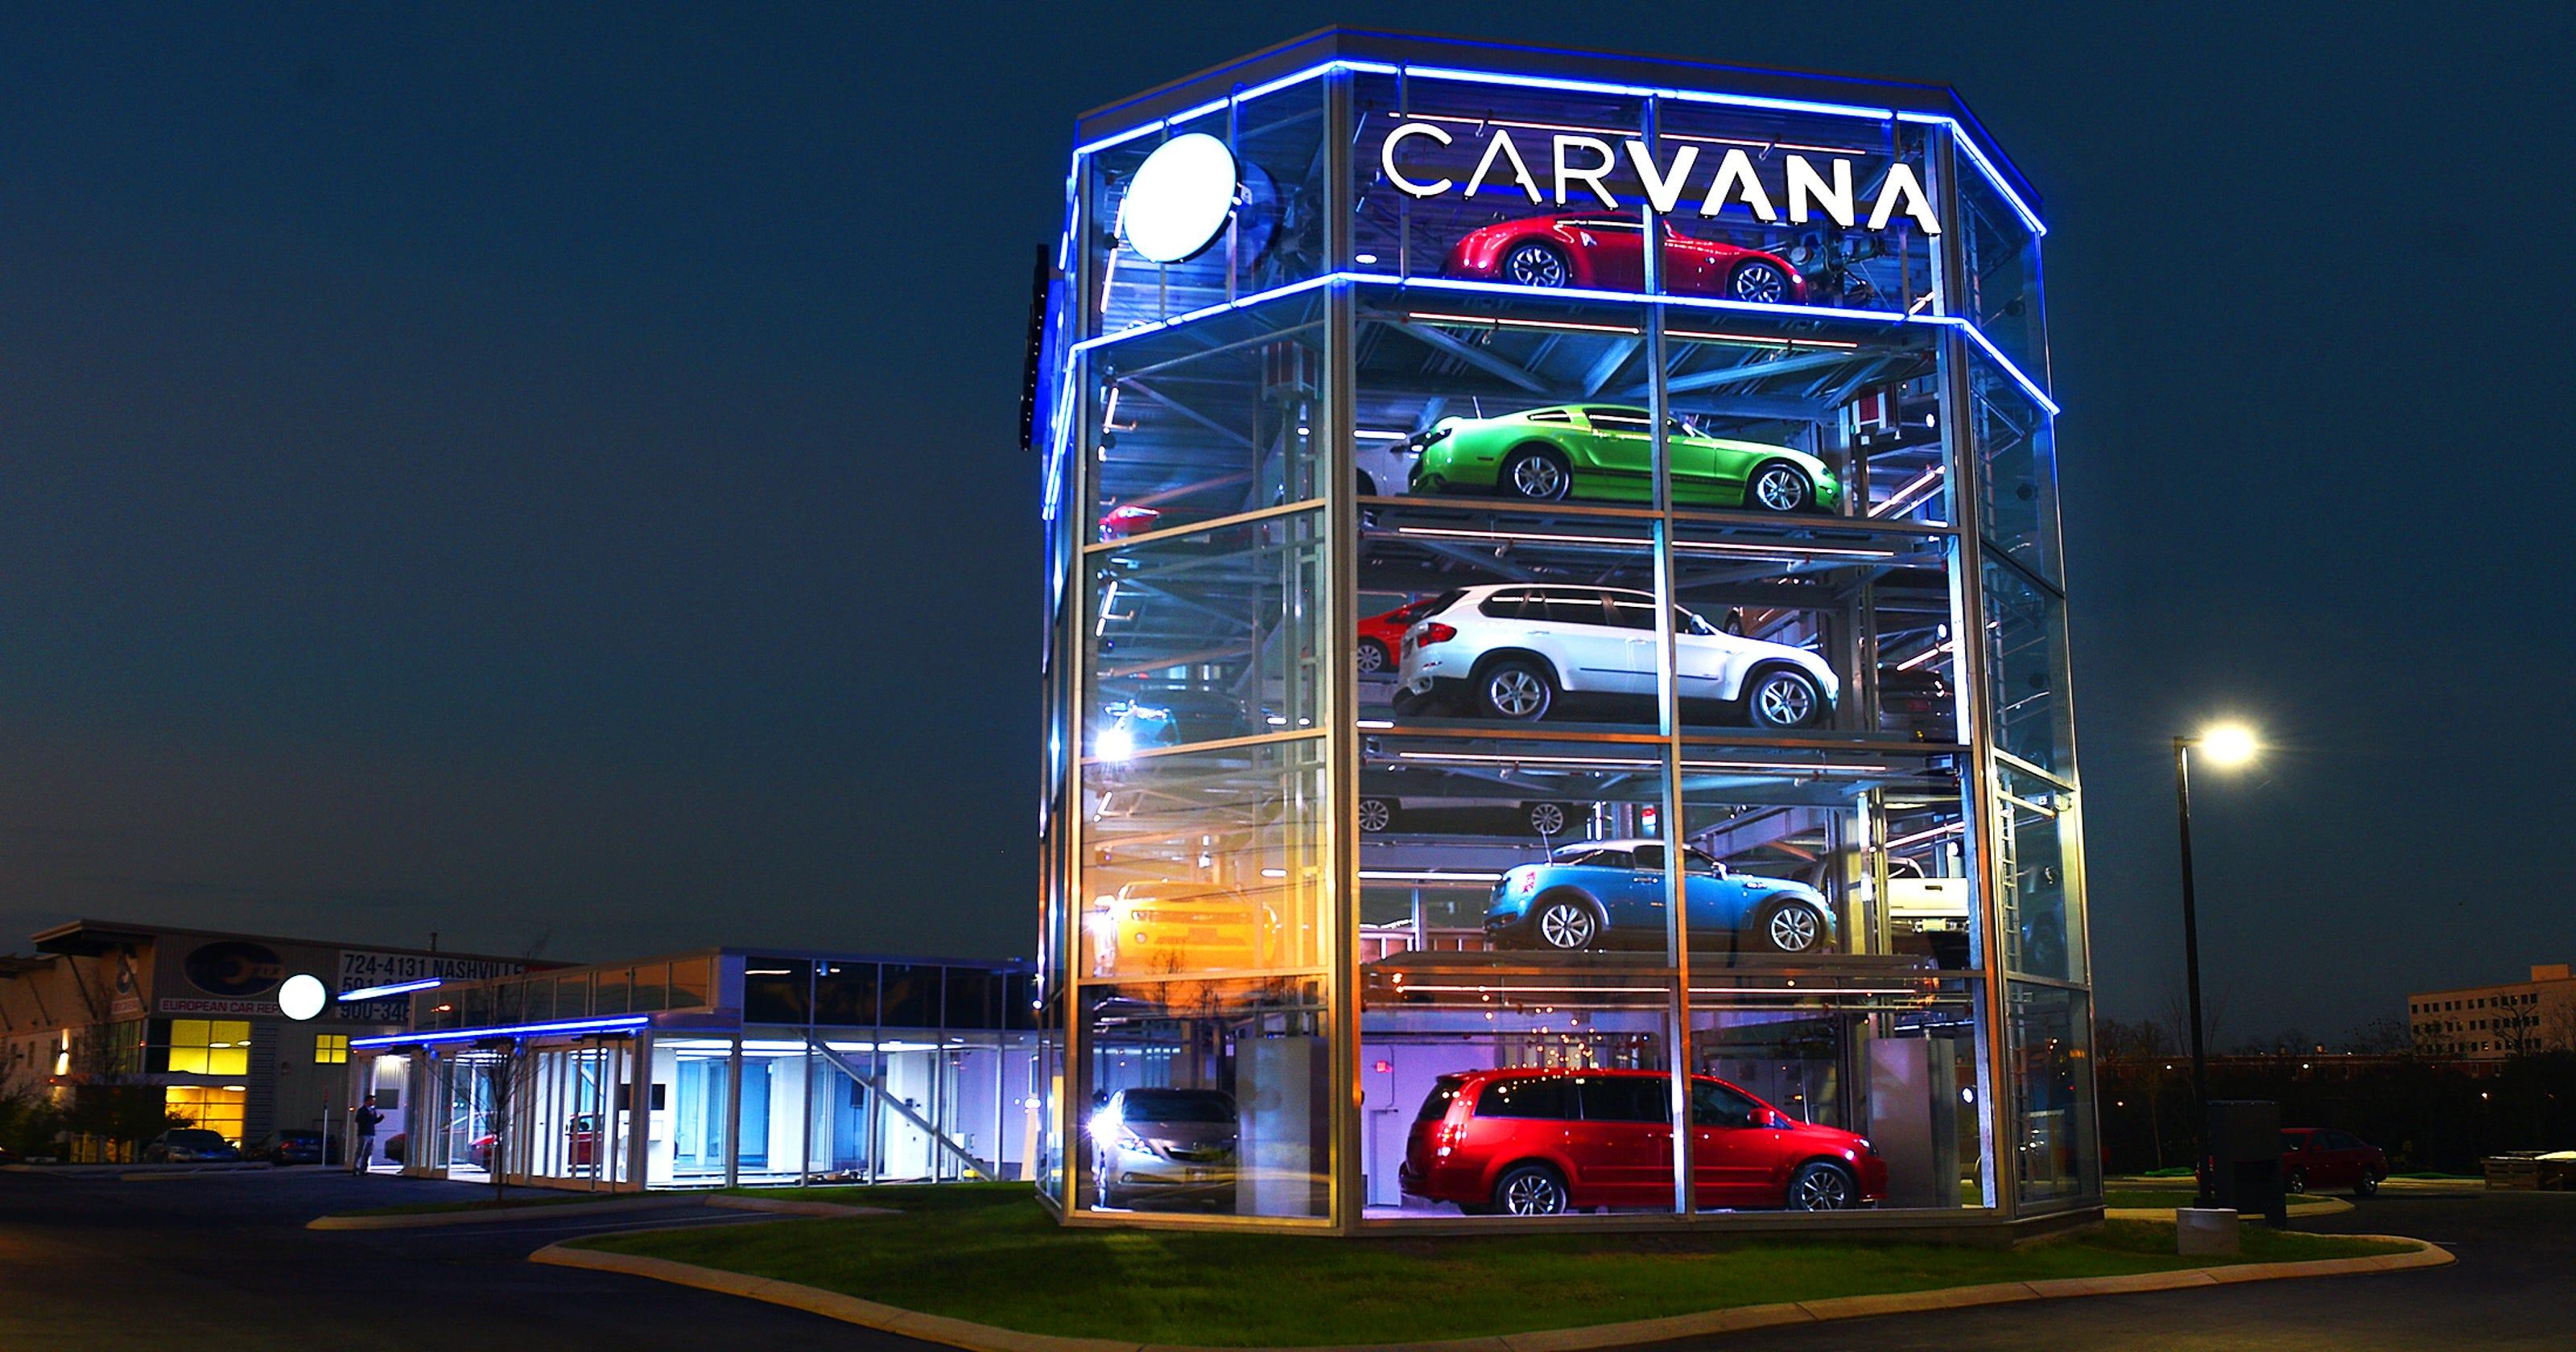 how do you get a carvana coin